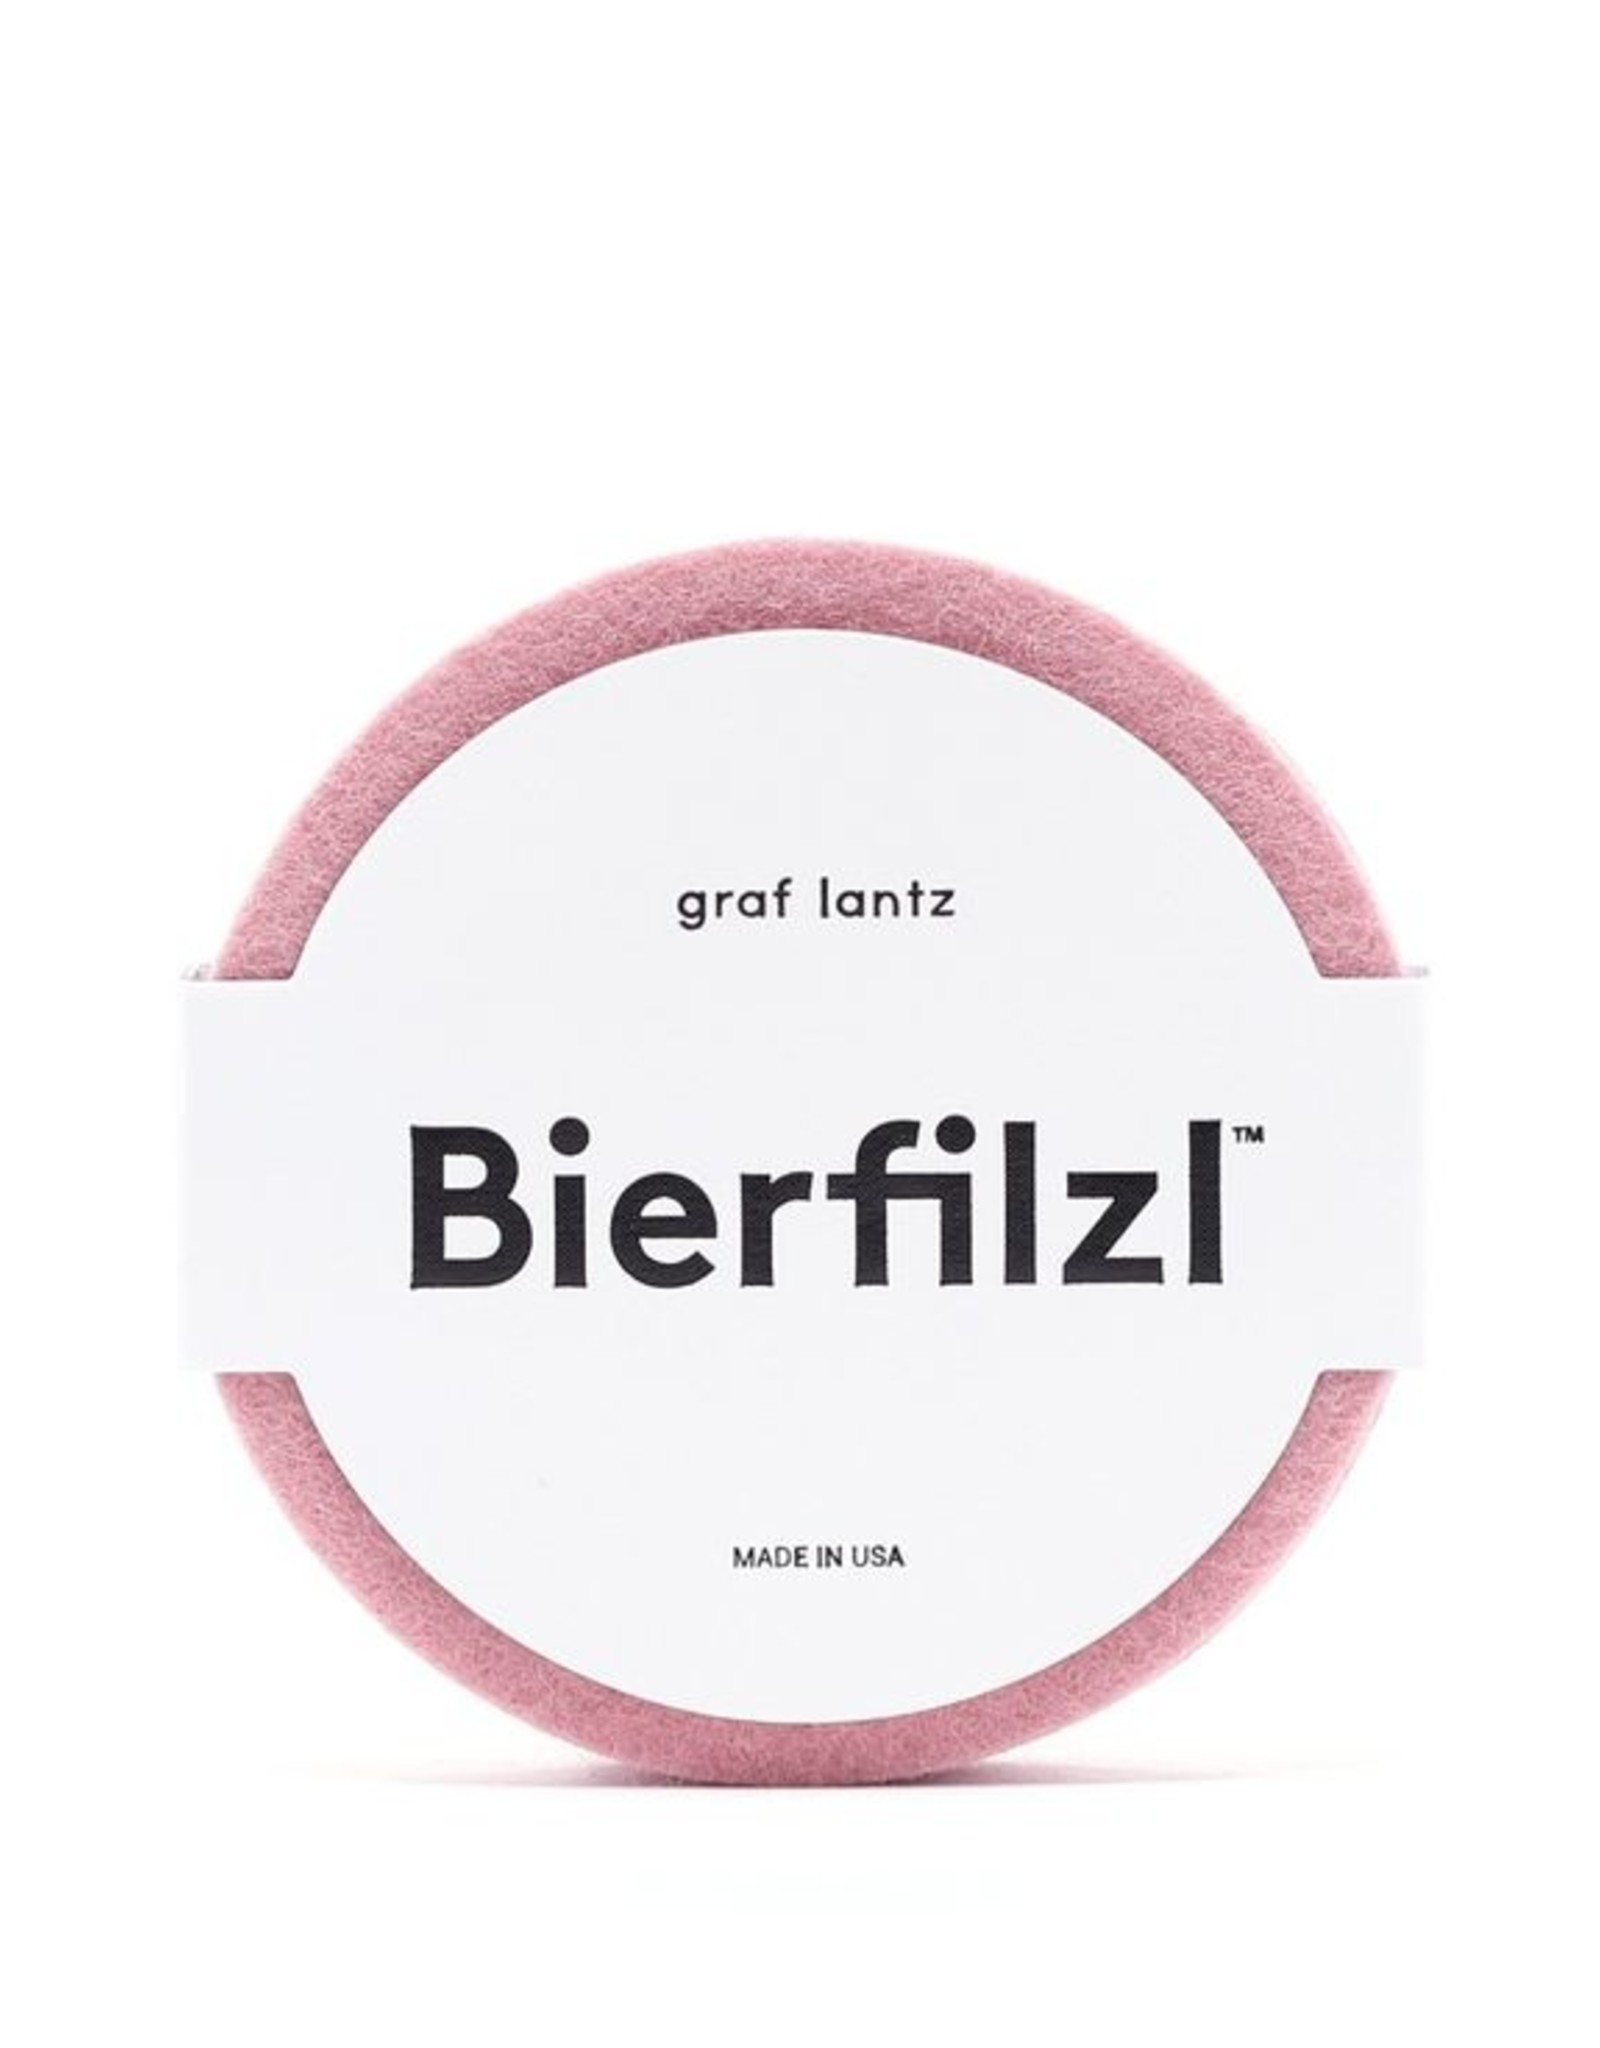 Graf&Lantz Bierfilzl Round Felt Coaster 4 Pack - Rouge